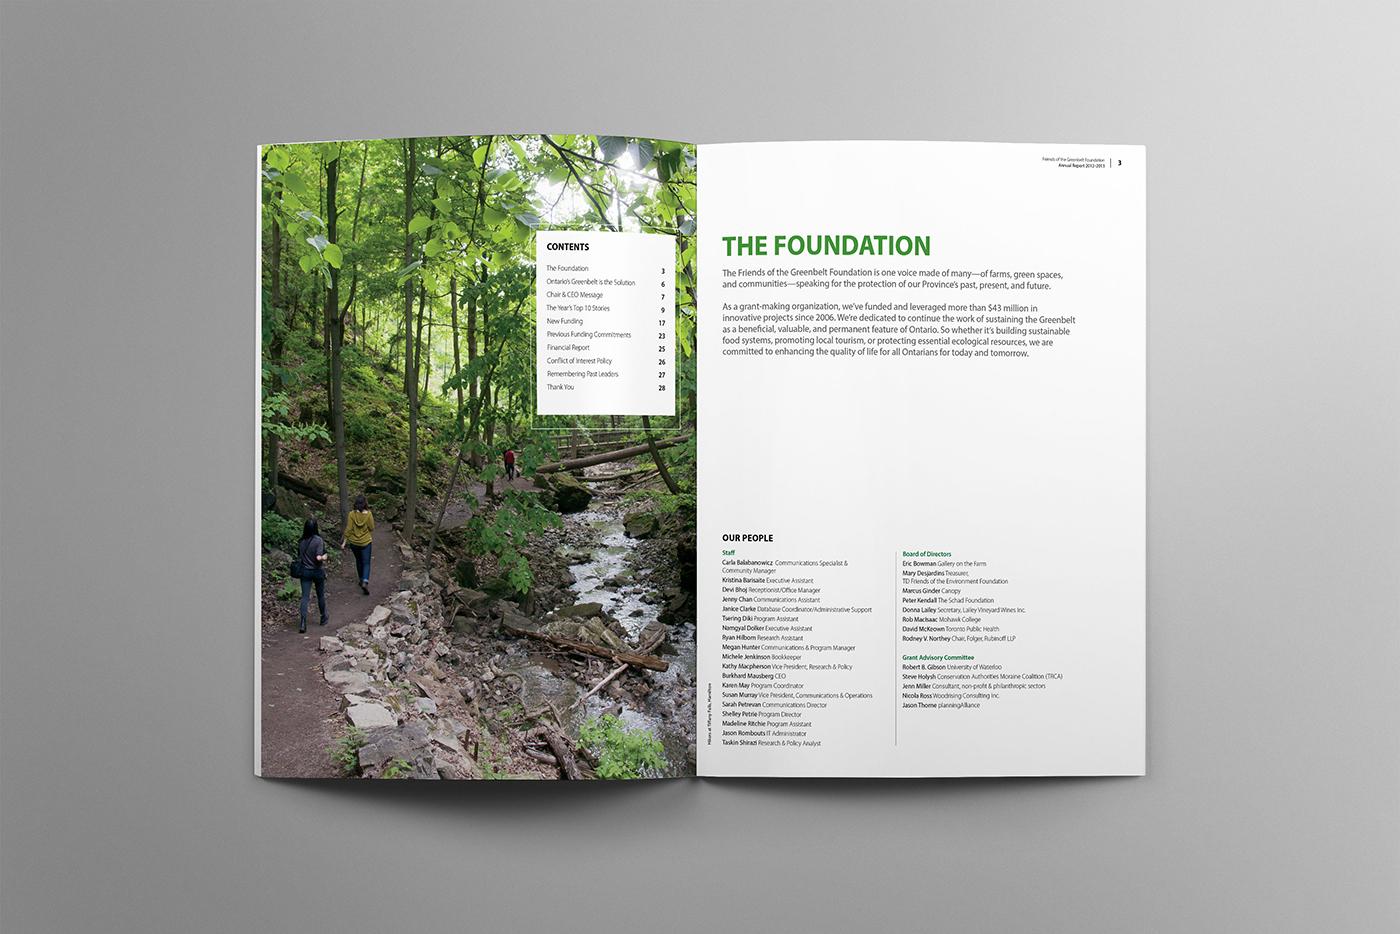 Greenbelt foundation index. Hiking within the greenbelt.